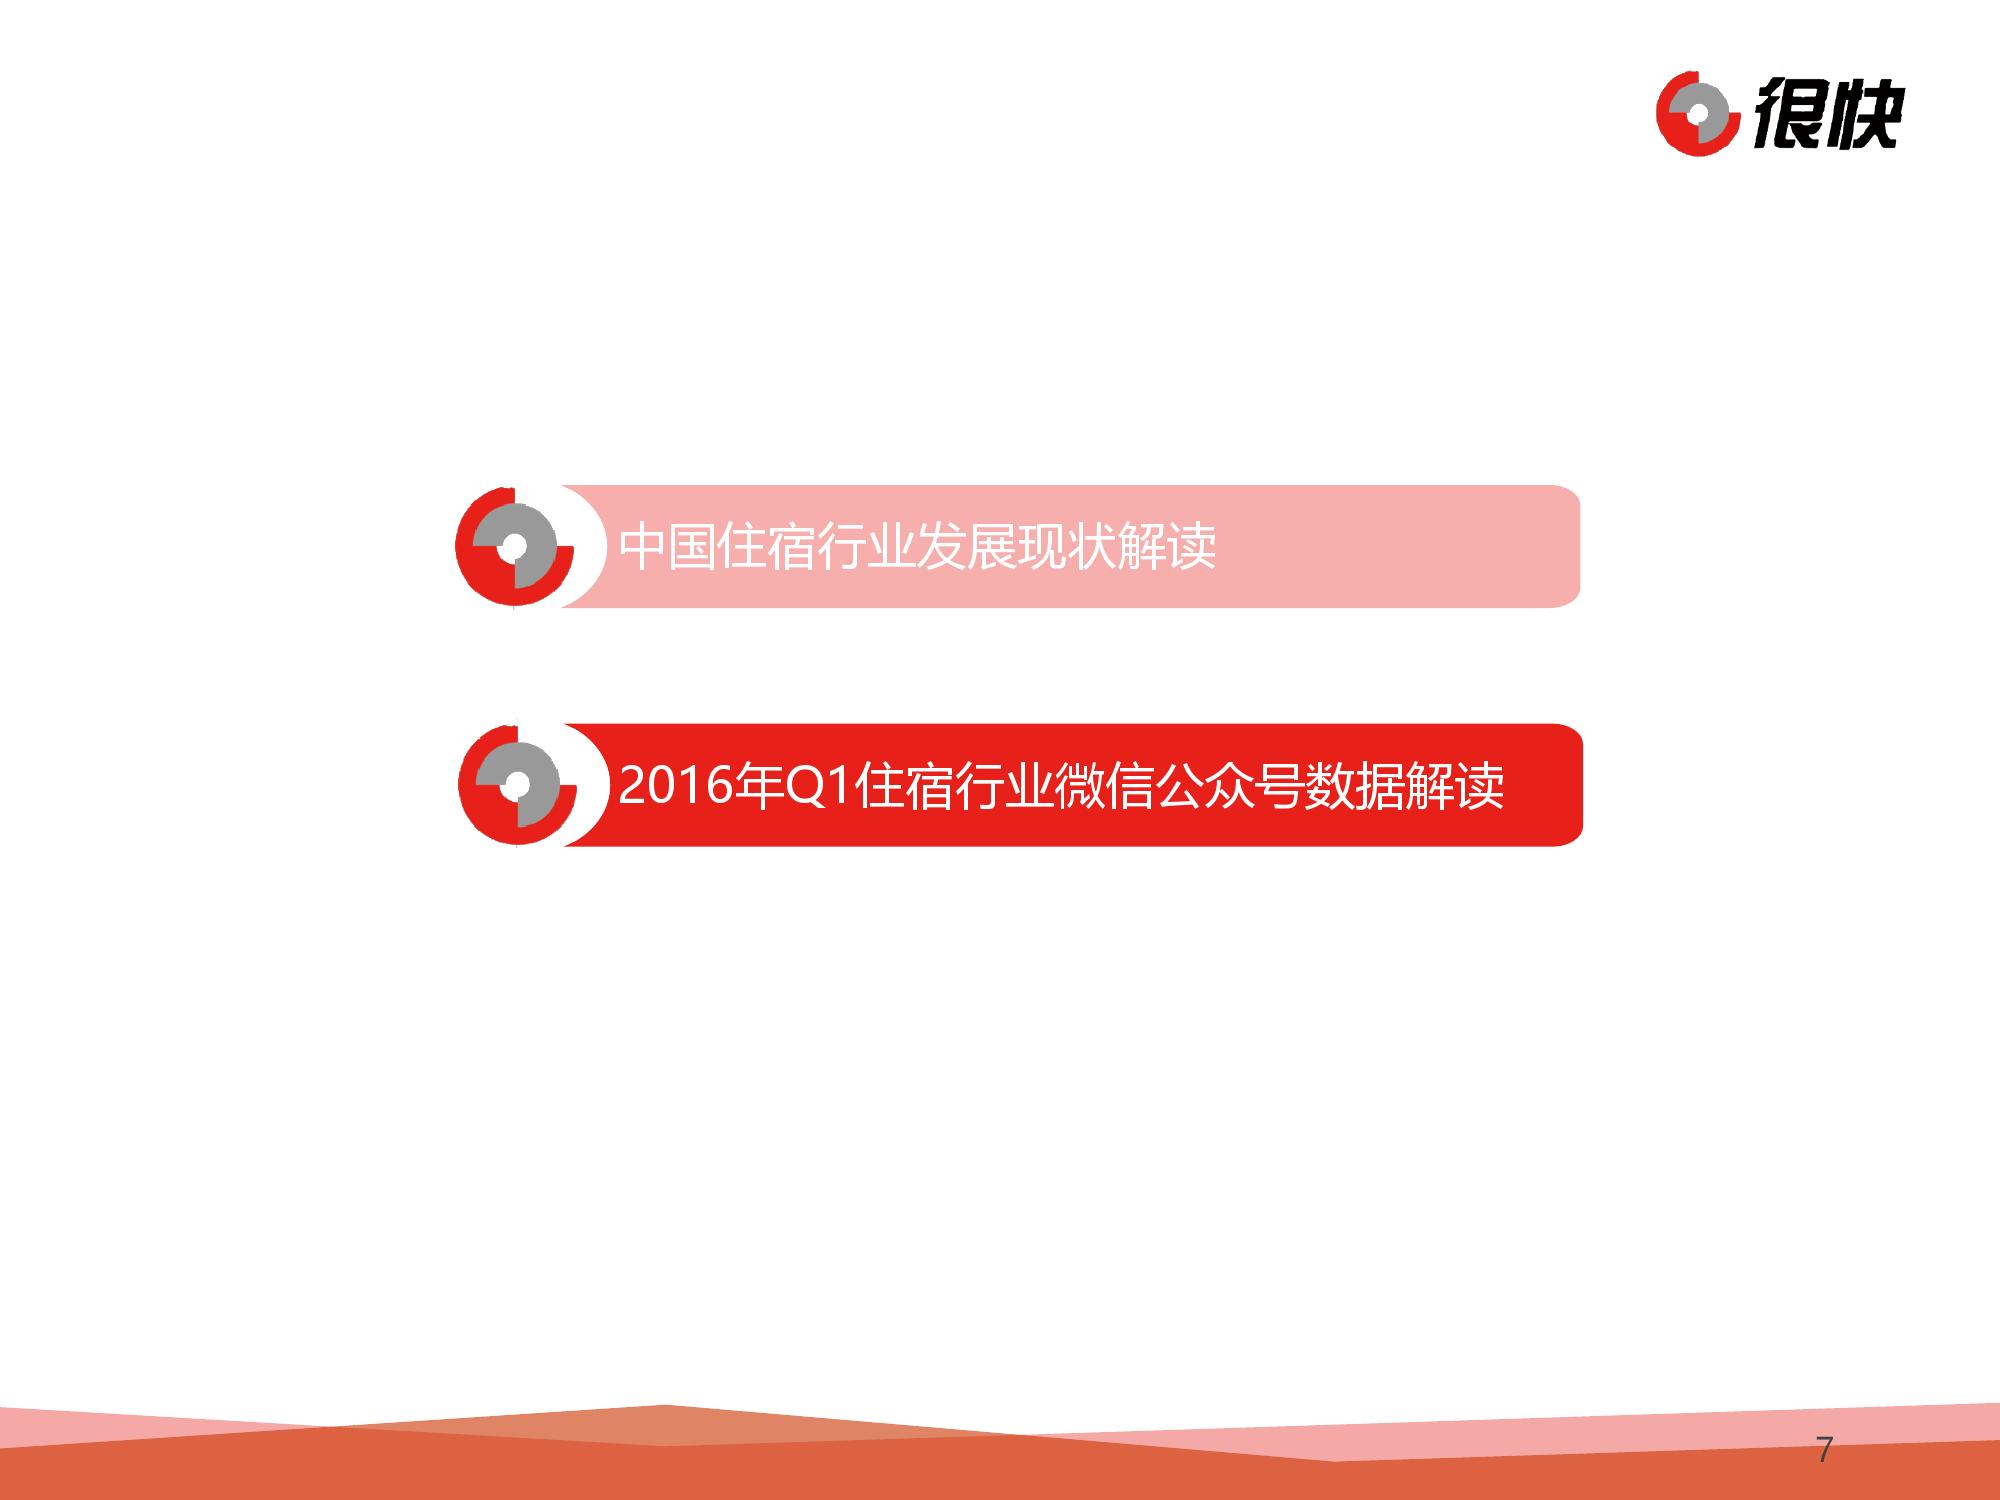 Henkuai-2016Q1中国住宿行业微信公众号数据洞察报告0606_000007